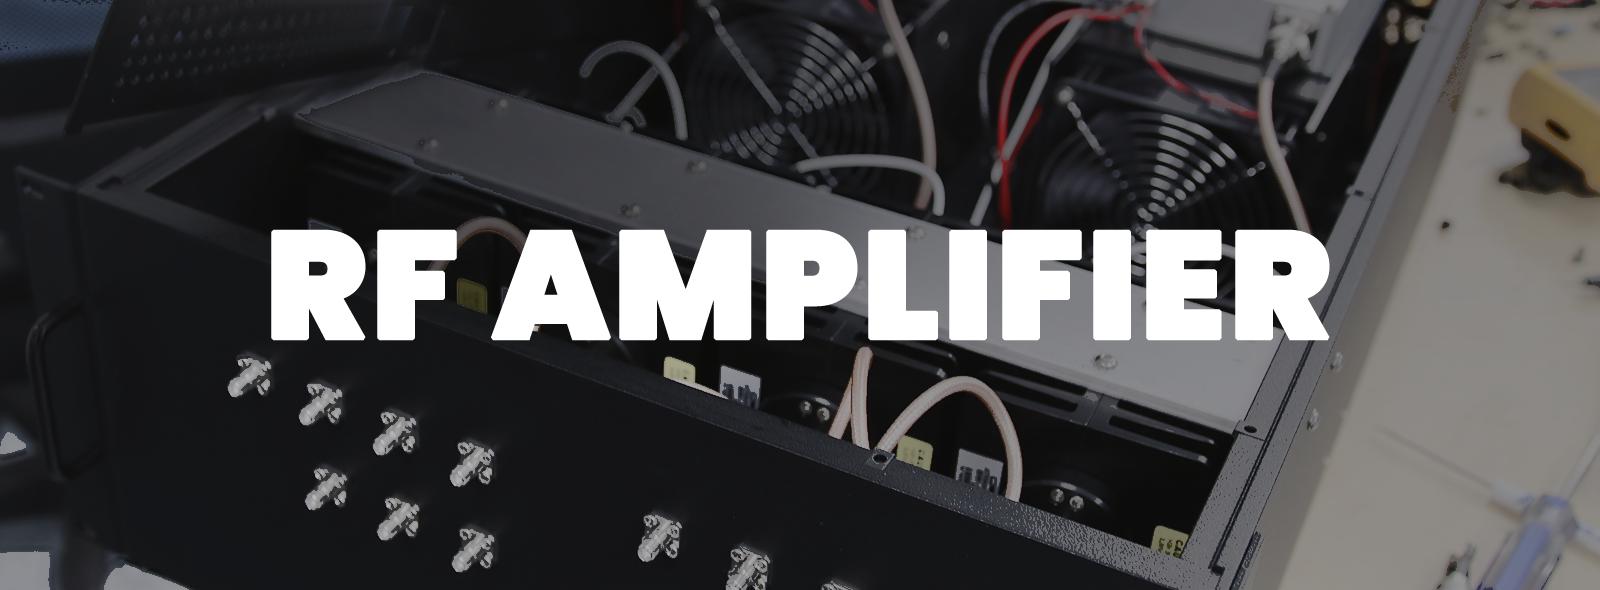 RF Amplifier Case Study Header Graphic